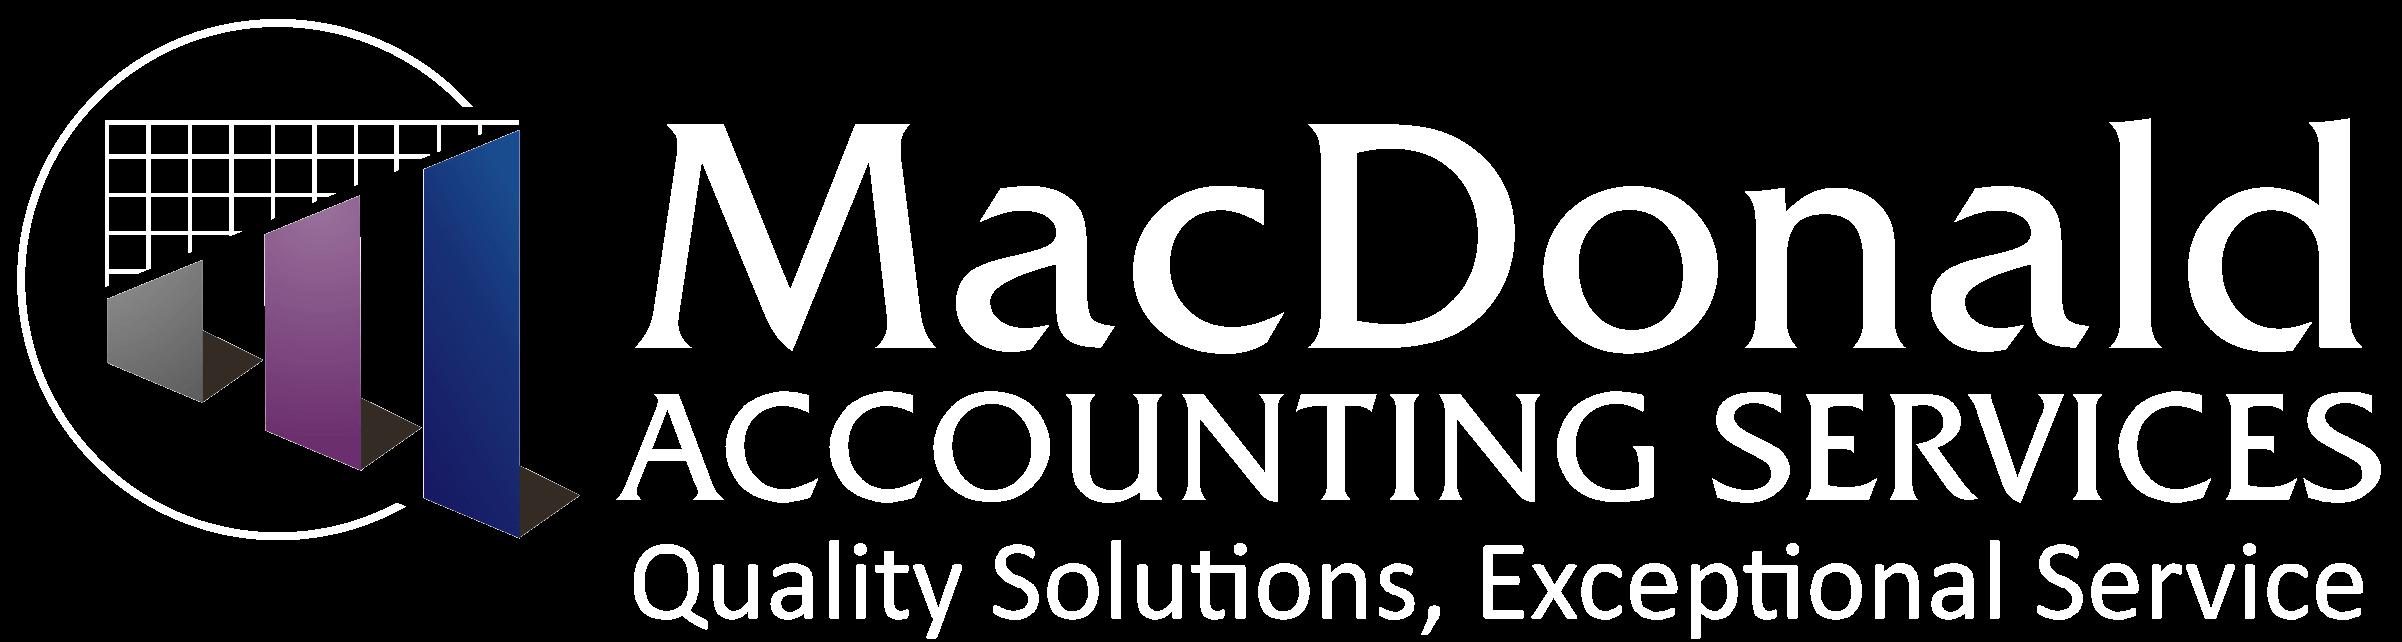 MacDonald Accounting Services